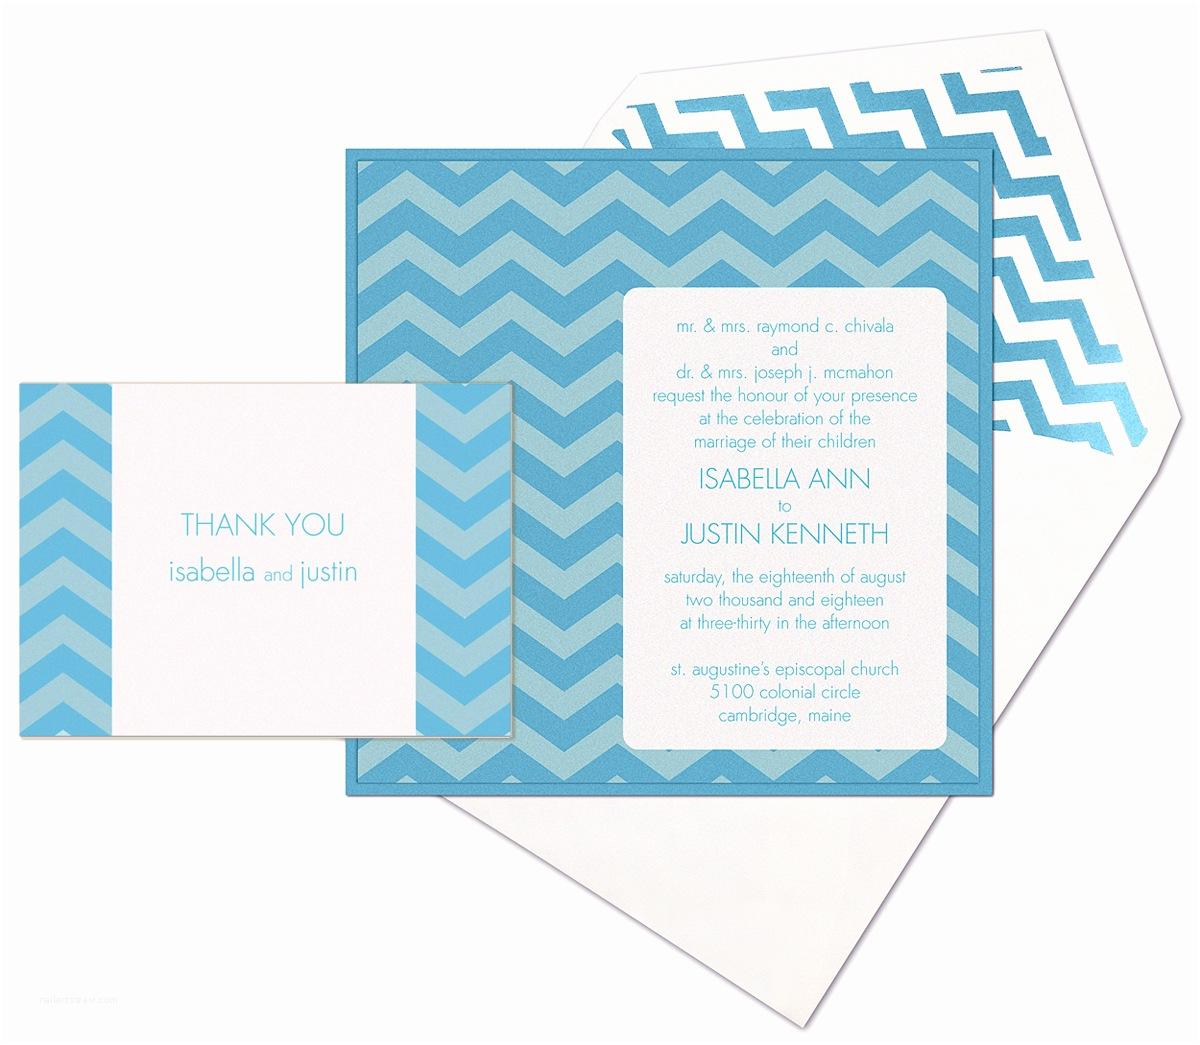 Wholesale Wedding Invitation Albums Krepe Kraft S Gallery Of wholesale Personalized